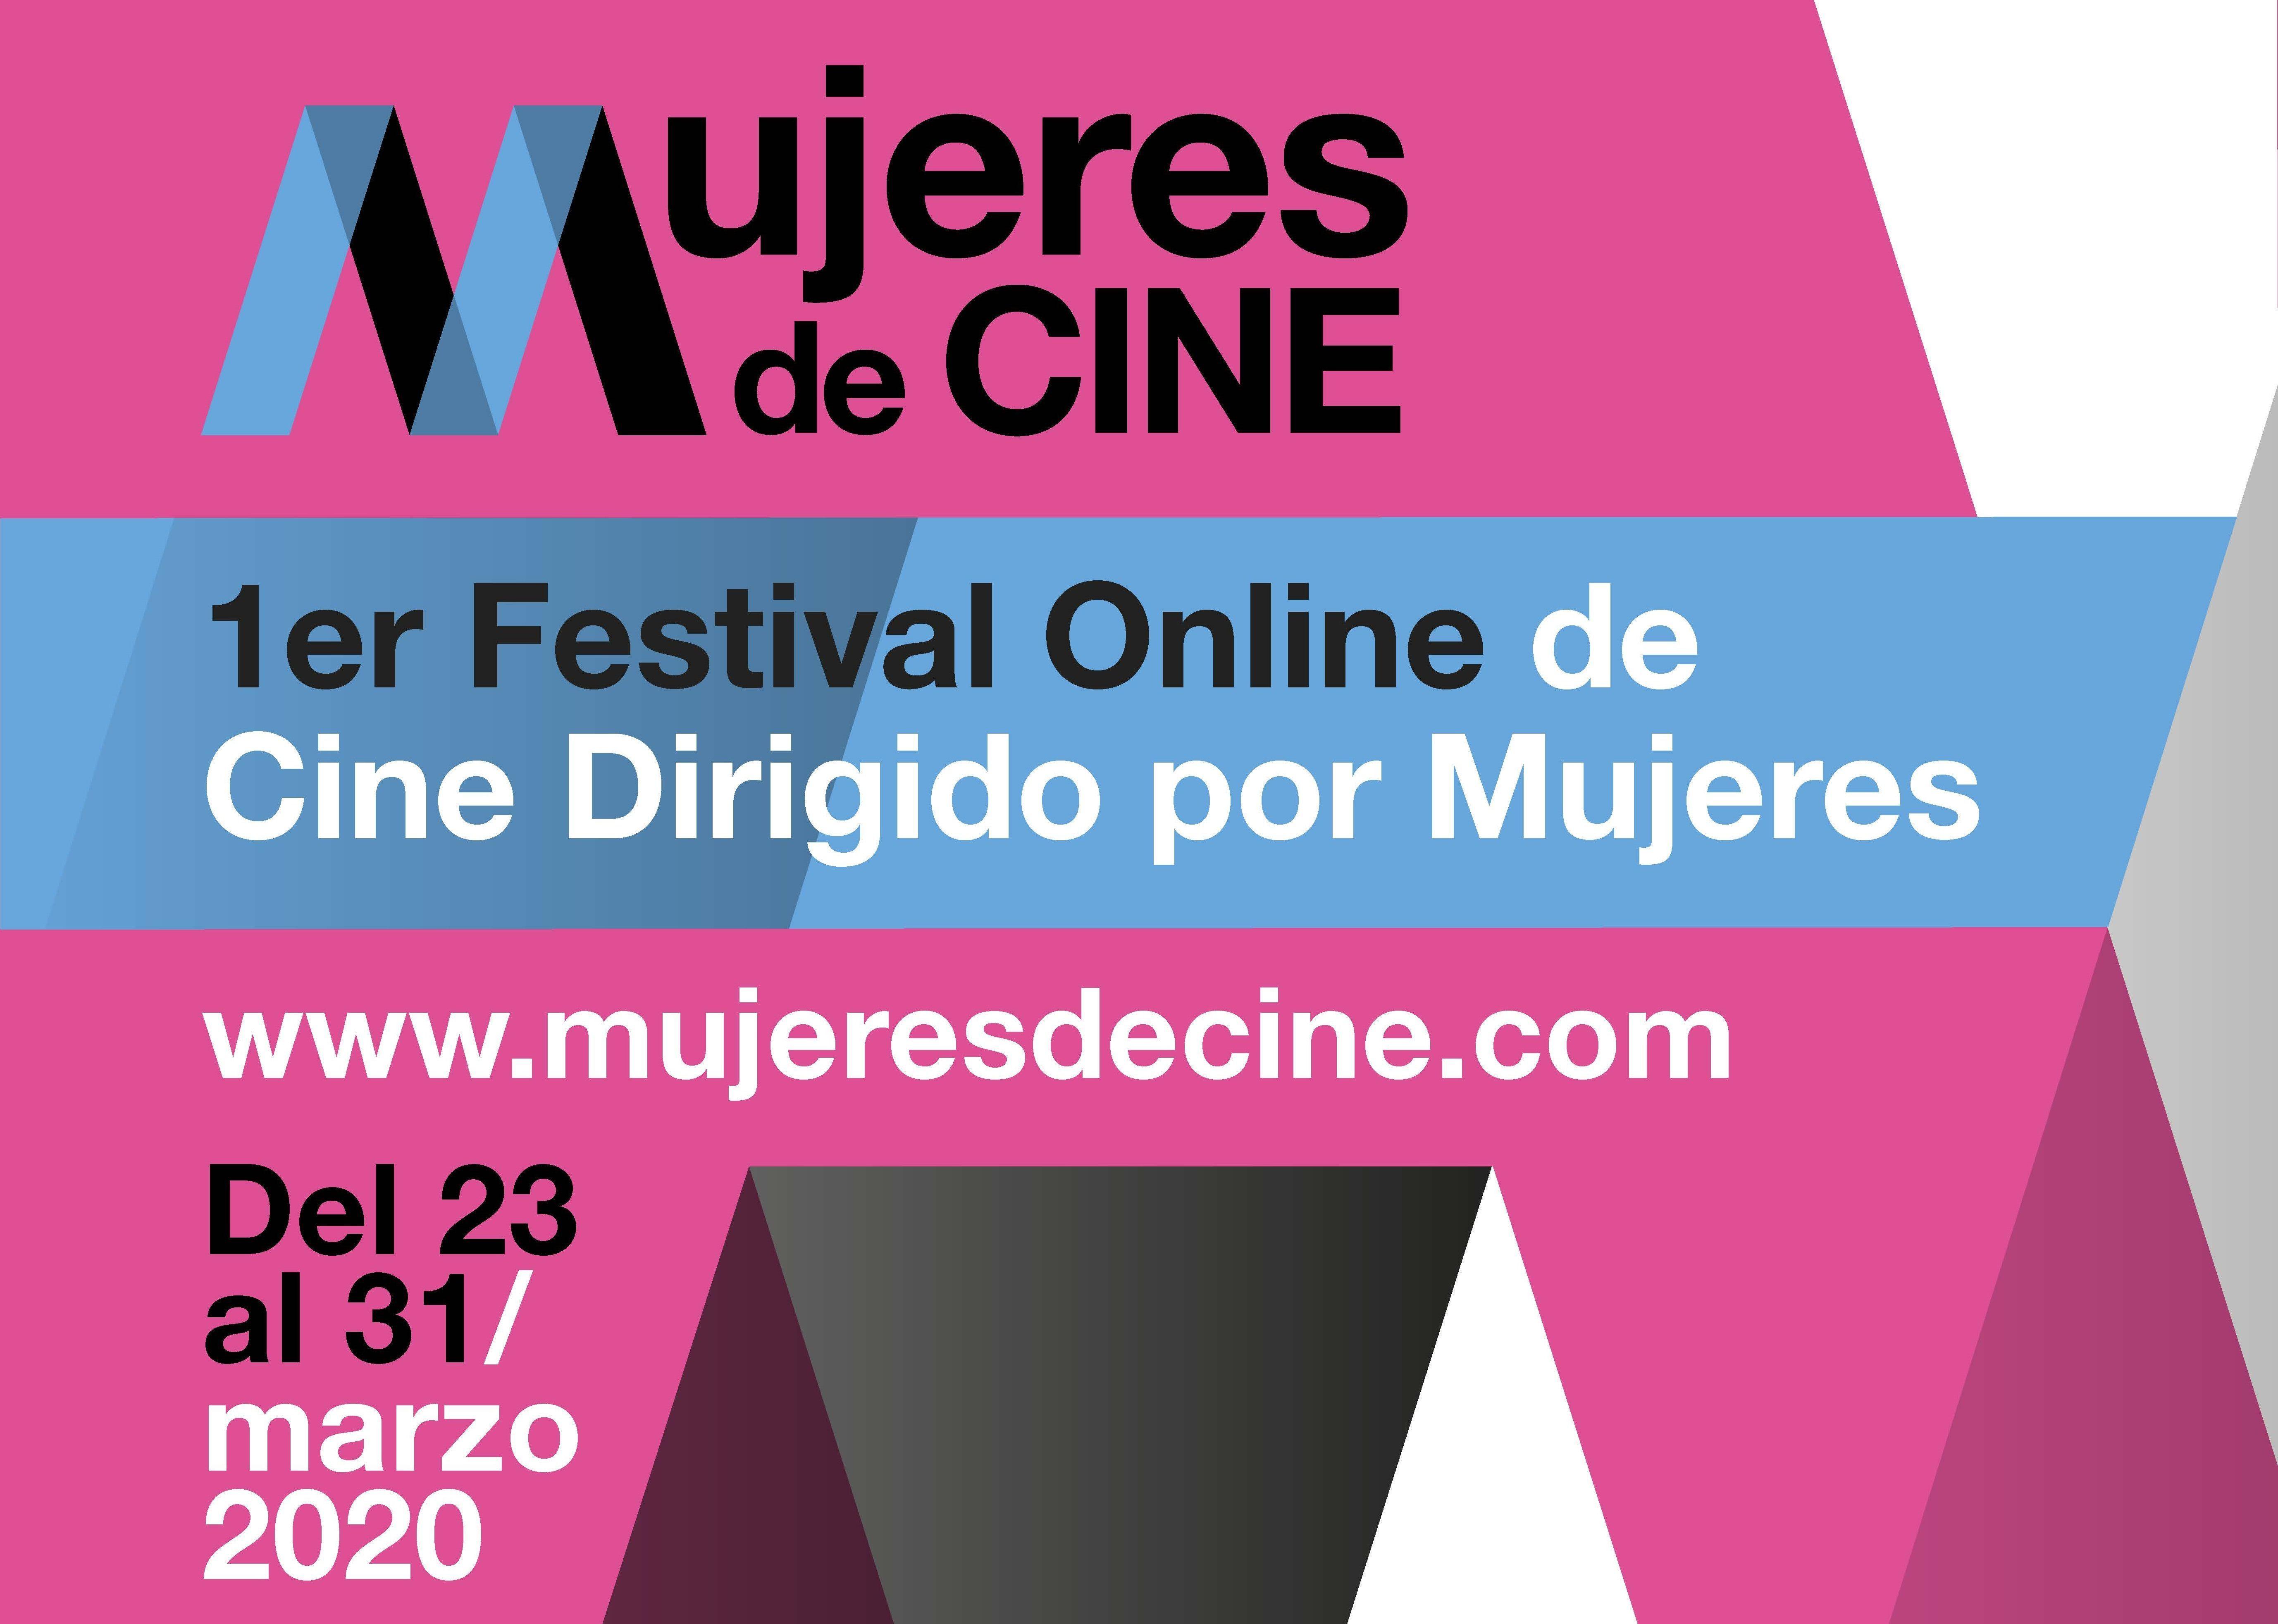 Festival Online Mujeres de Cine